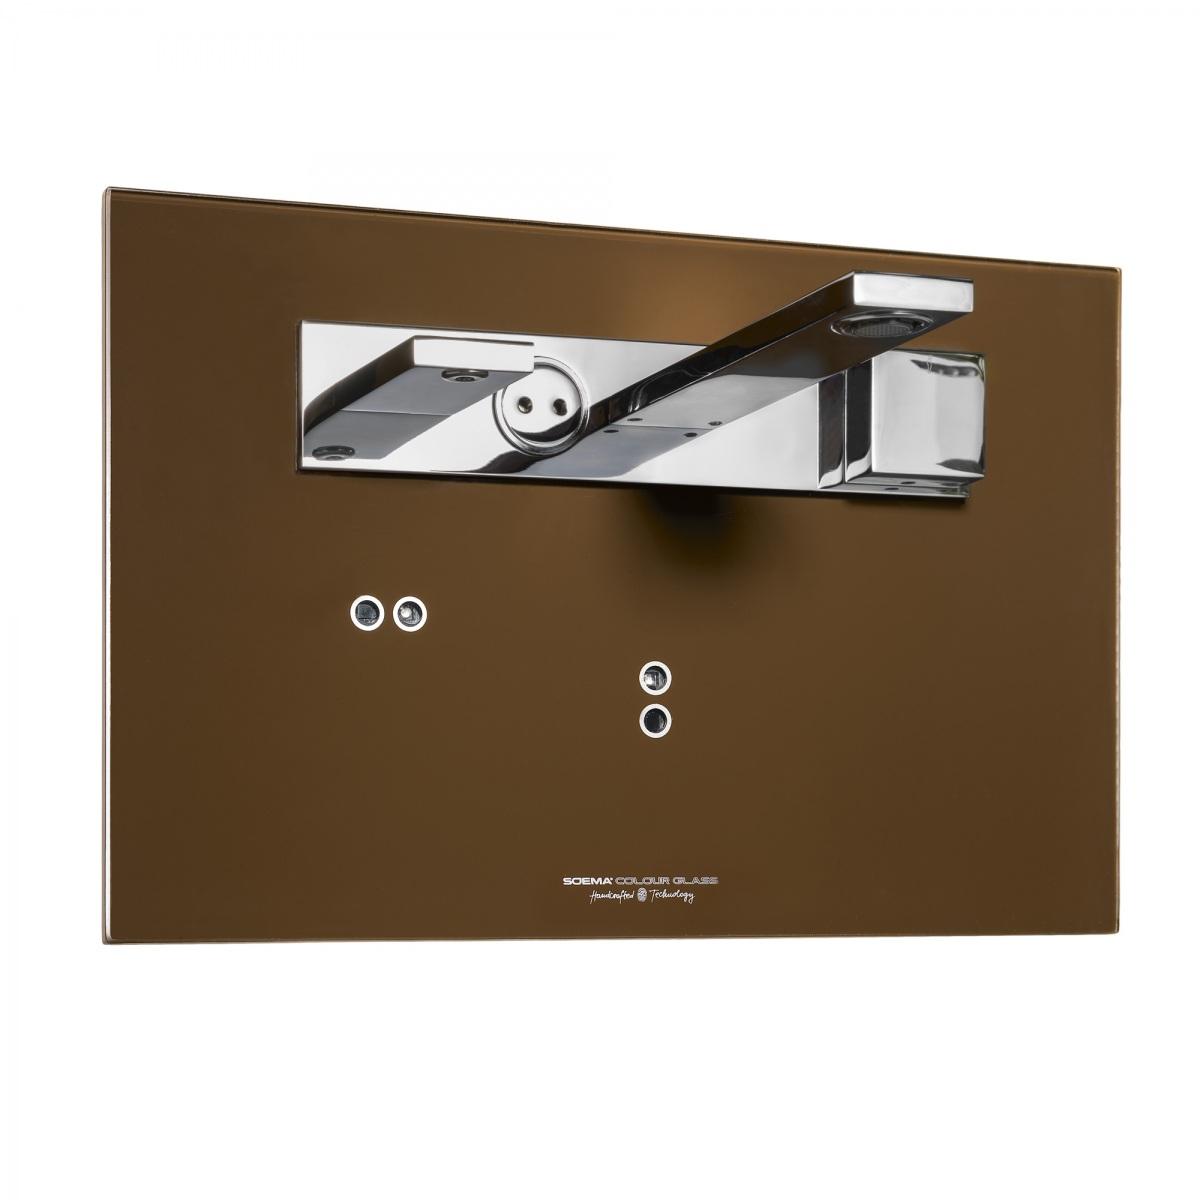 rubinetto_dosatore_C612V_soema_1